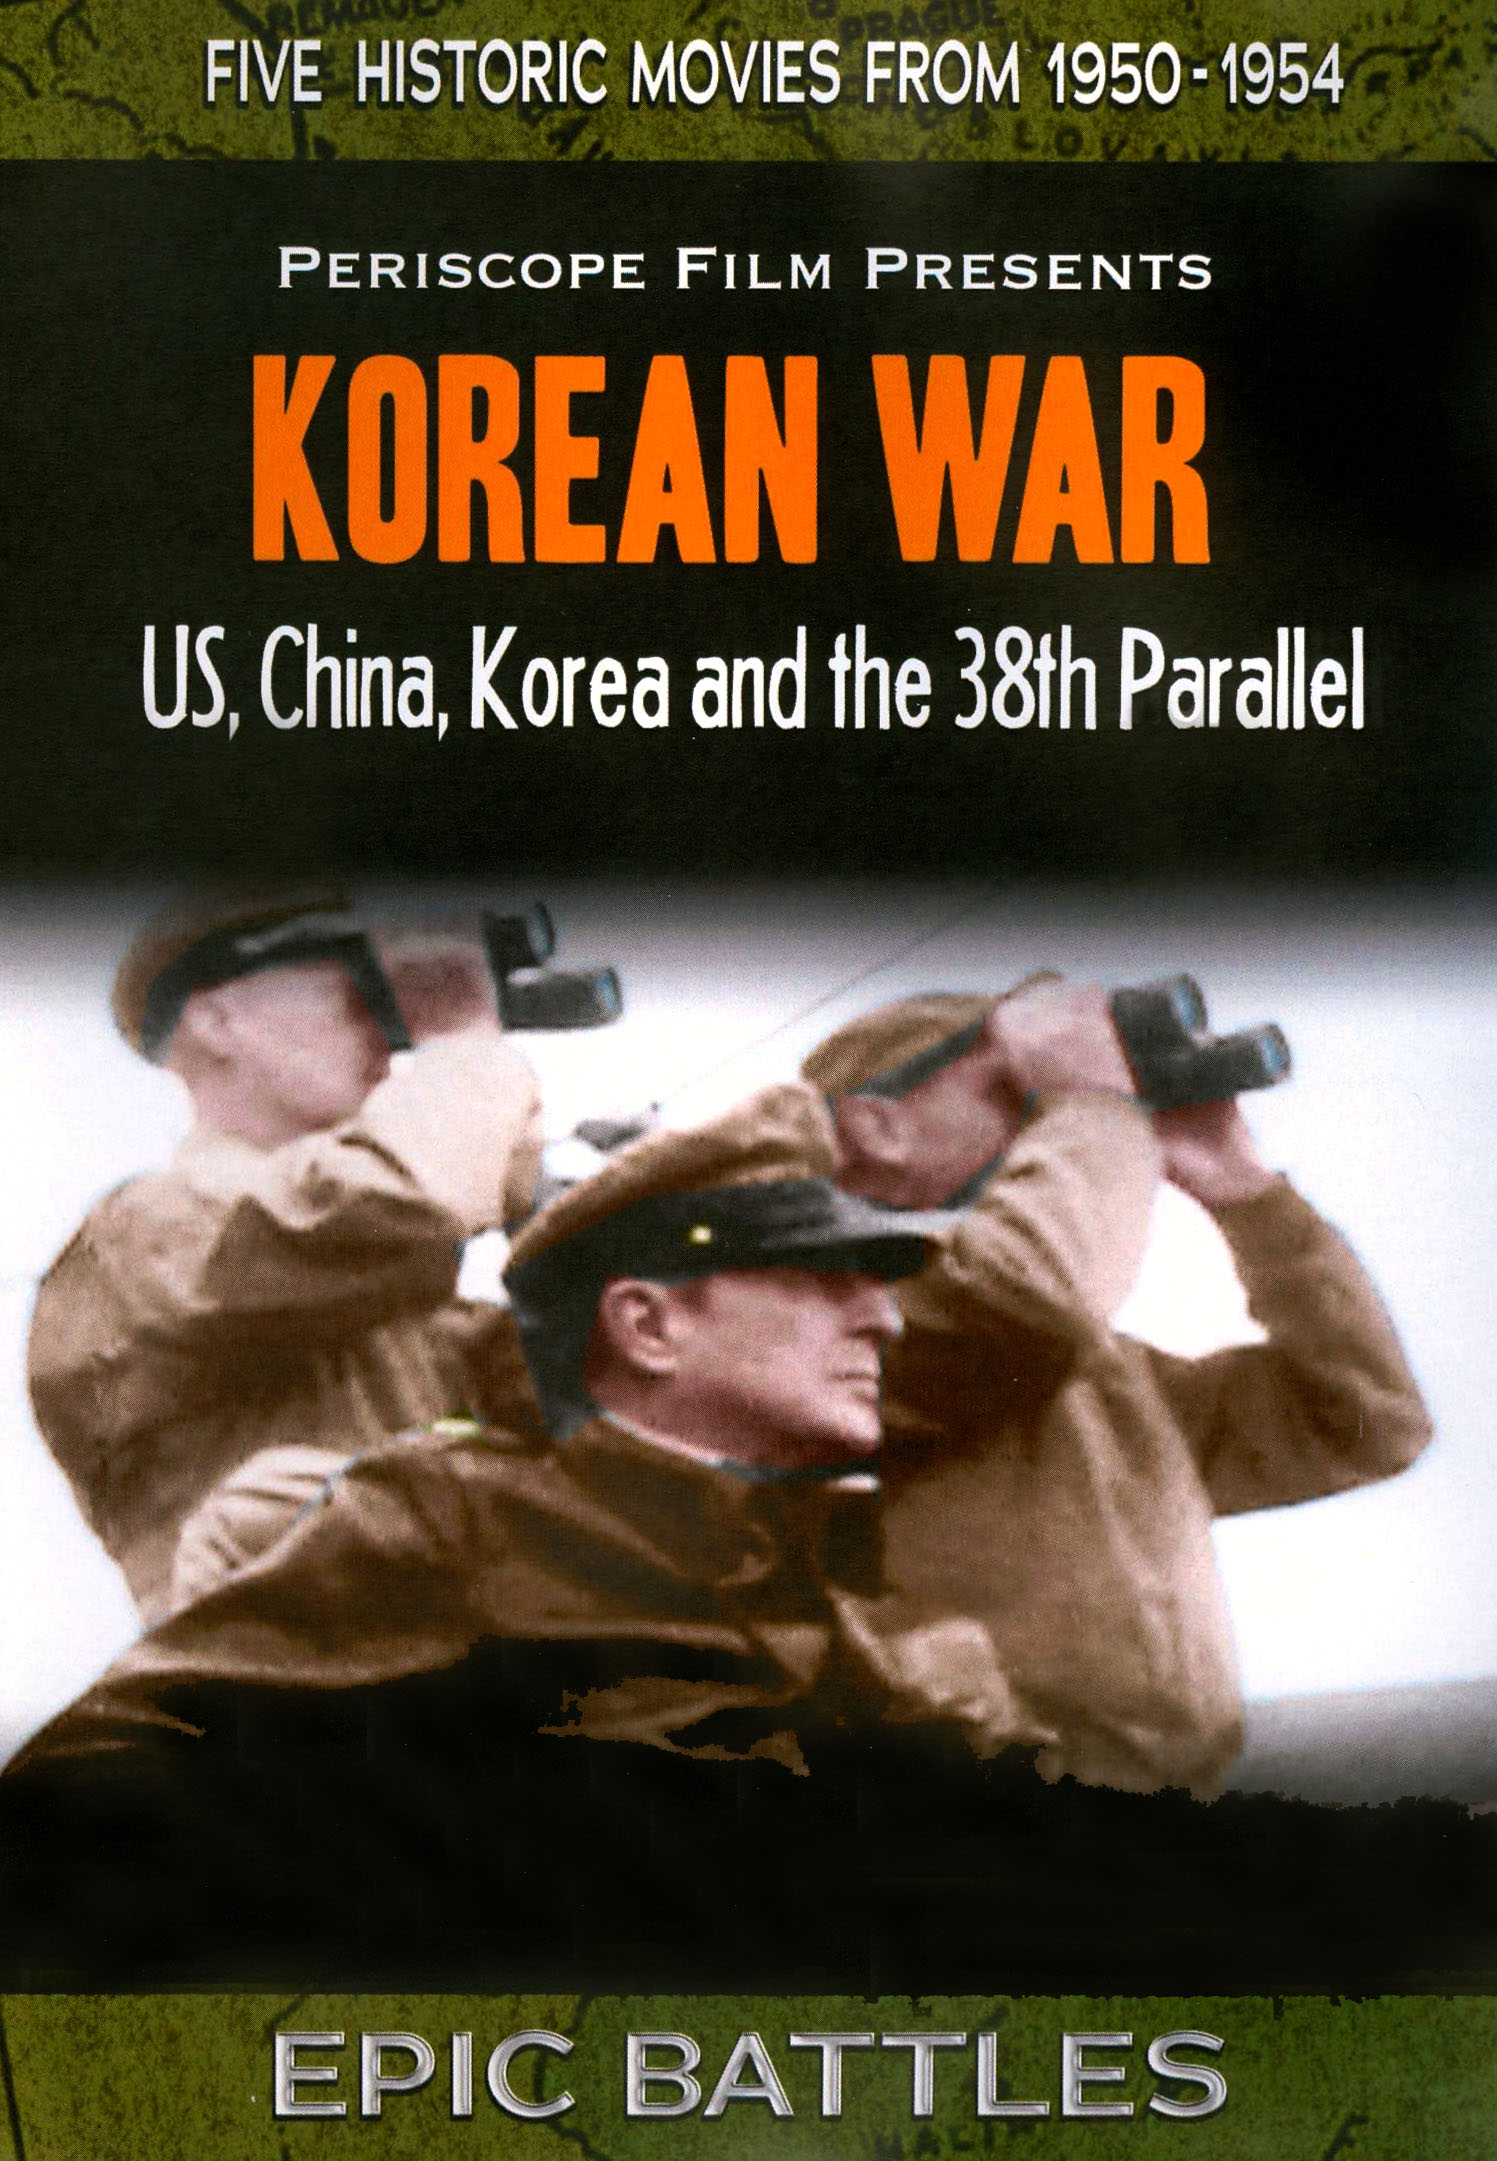 Korean War: US, China, Korea and the 38th Parallel